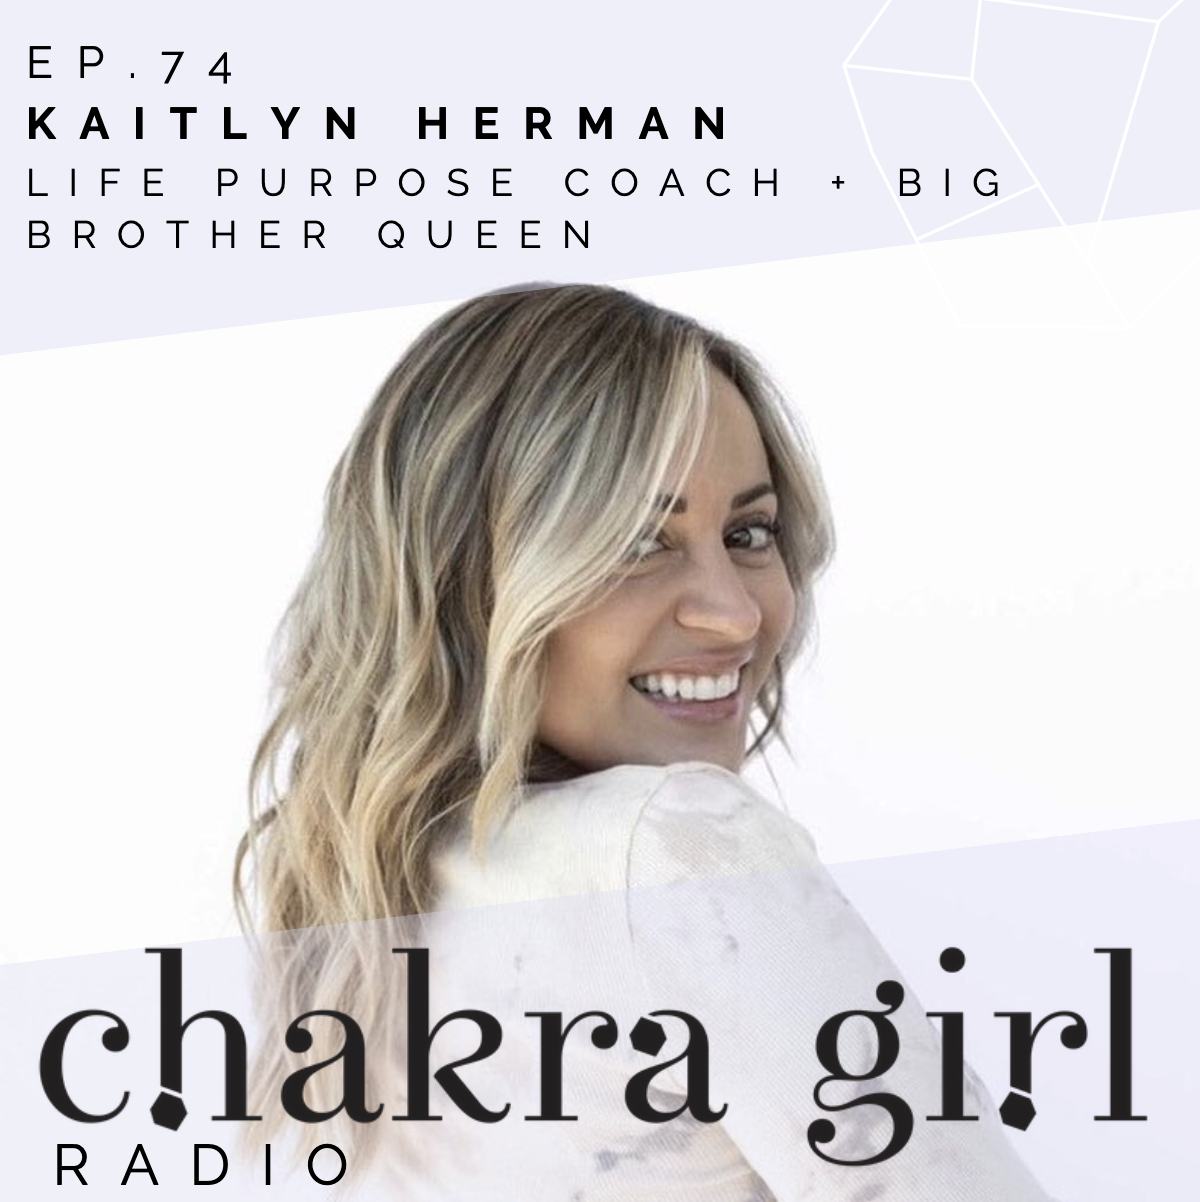 KAITLYN HERMAN CHAKRA GIRL RADIO